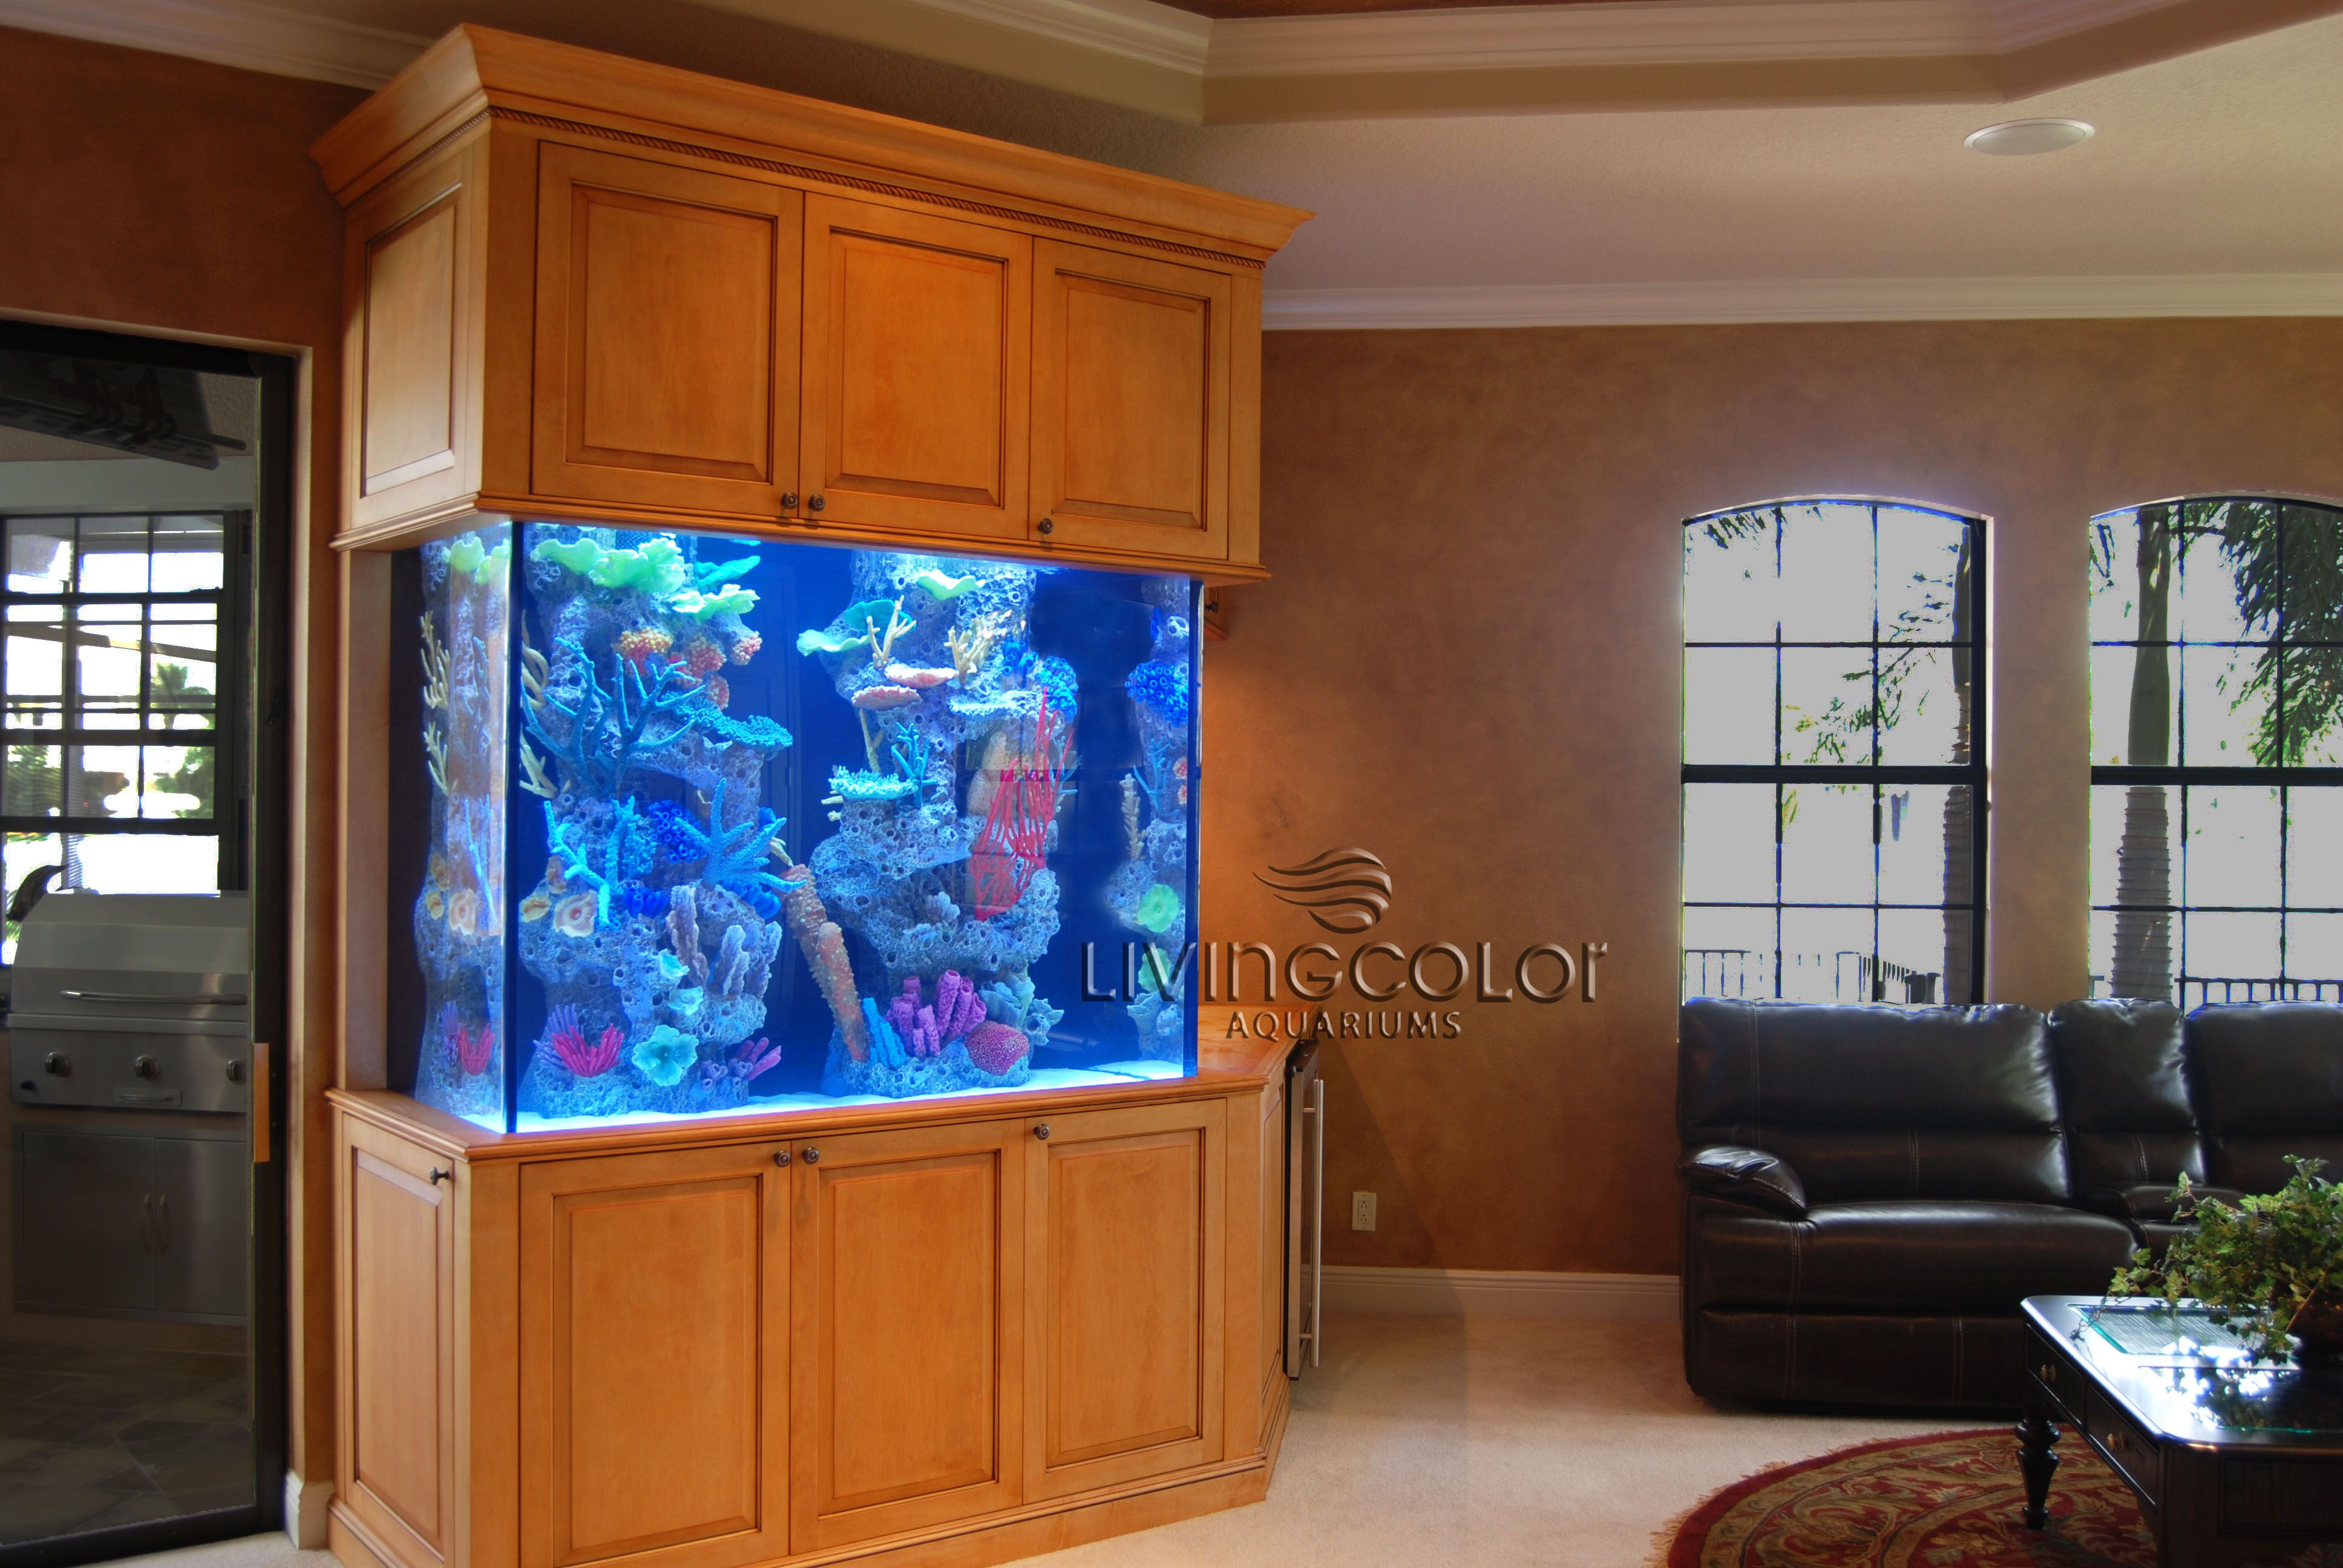 Marine fish aquarium using Panorama LED lights installed by Living